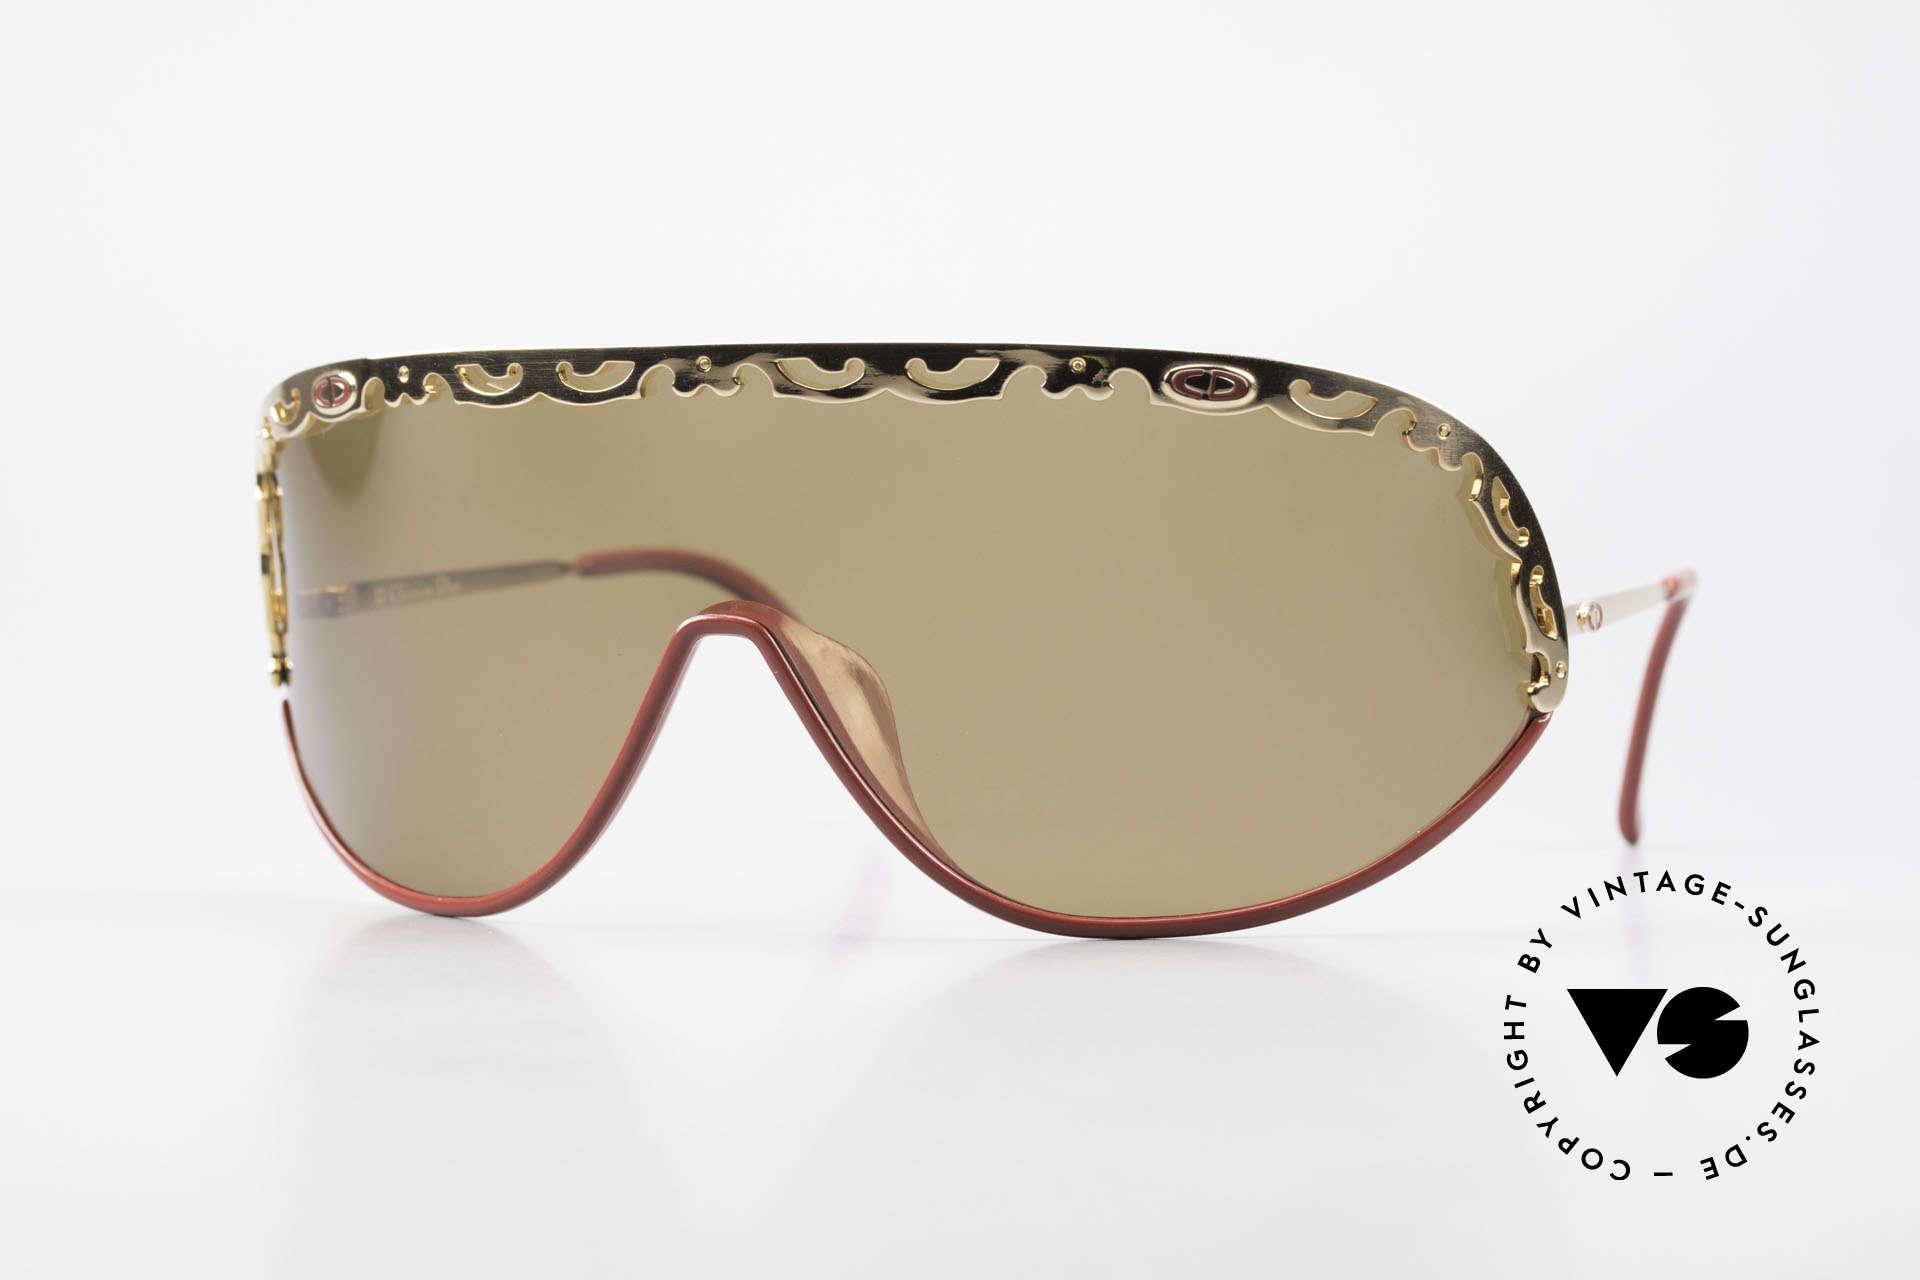 Christian Dior 2501 Panorama View Sunglasses 80's, panorama view Dior designer sunglasses from 1989/1990, Made for Women